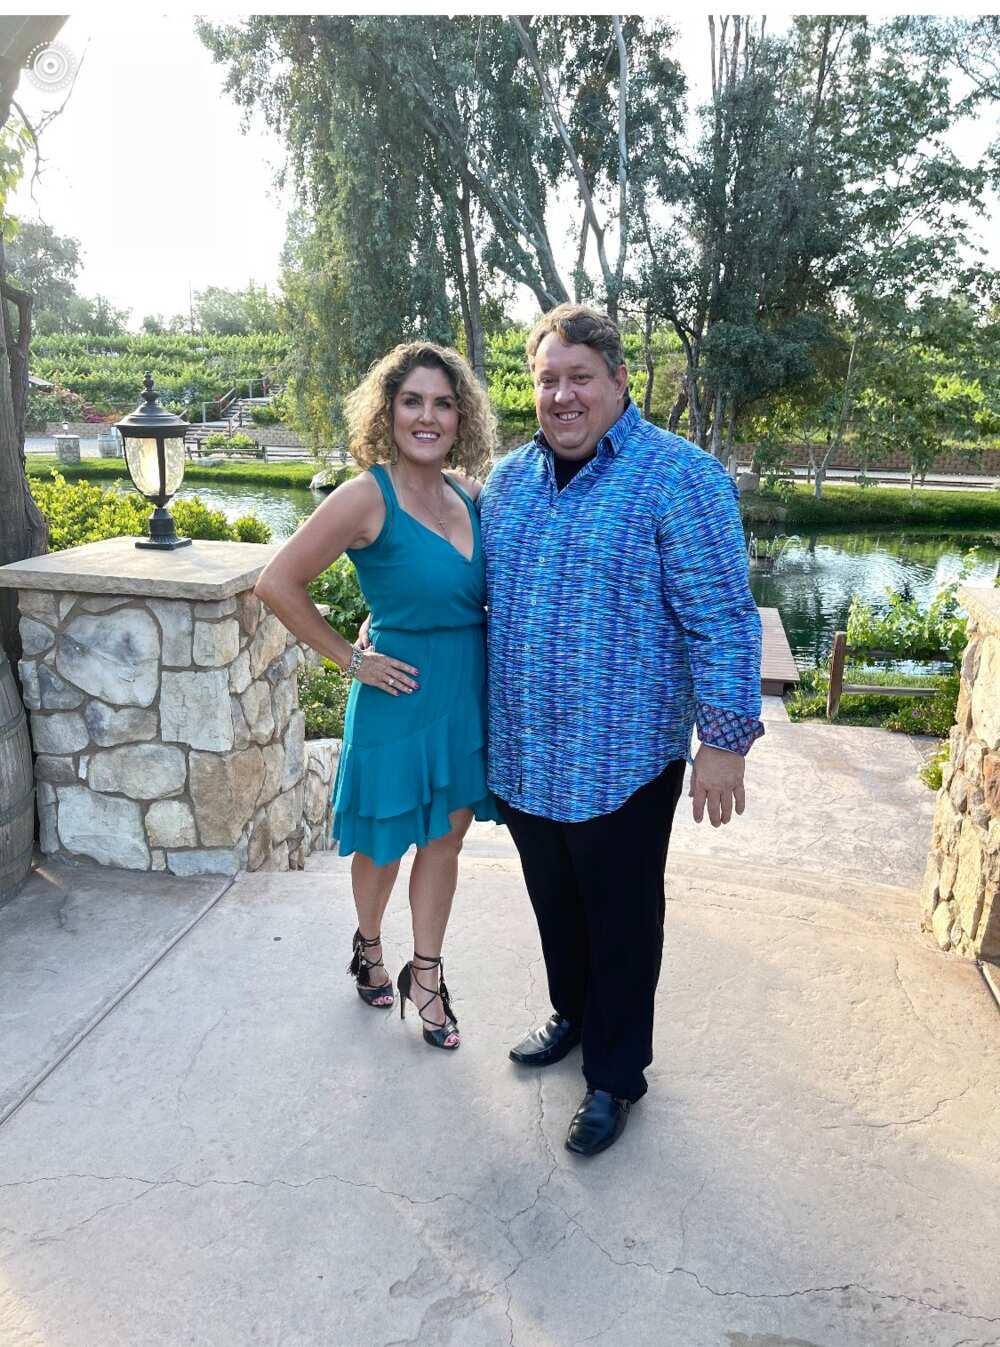 Casey Nezhoda's spouse